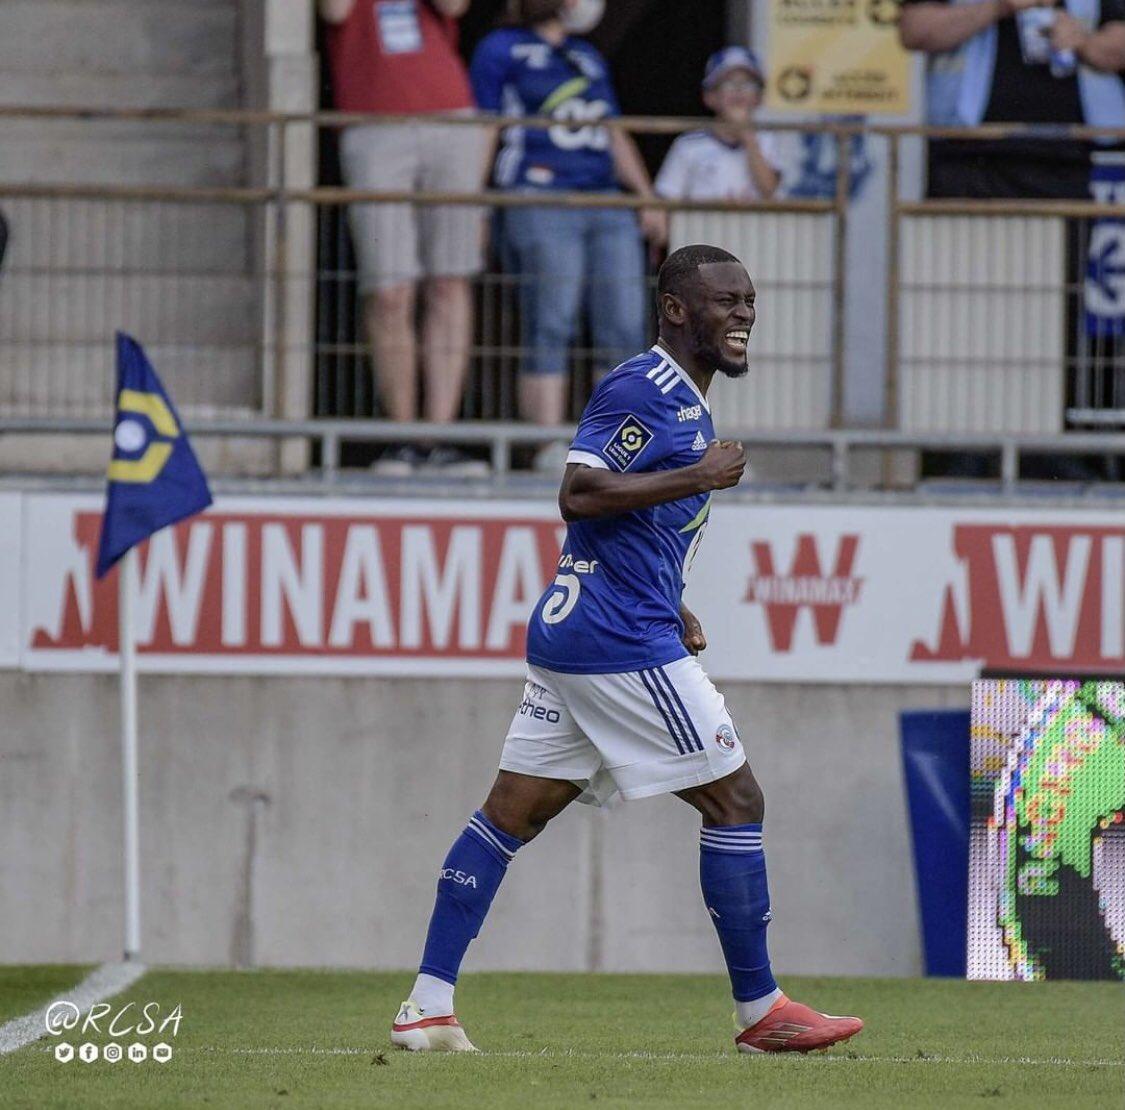 VIDEO: Ghana striker Majeed Warris on target for Strasbourg in pre-season win against Freiburg